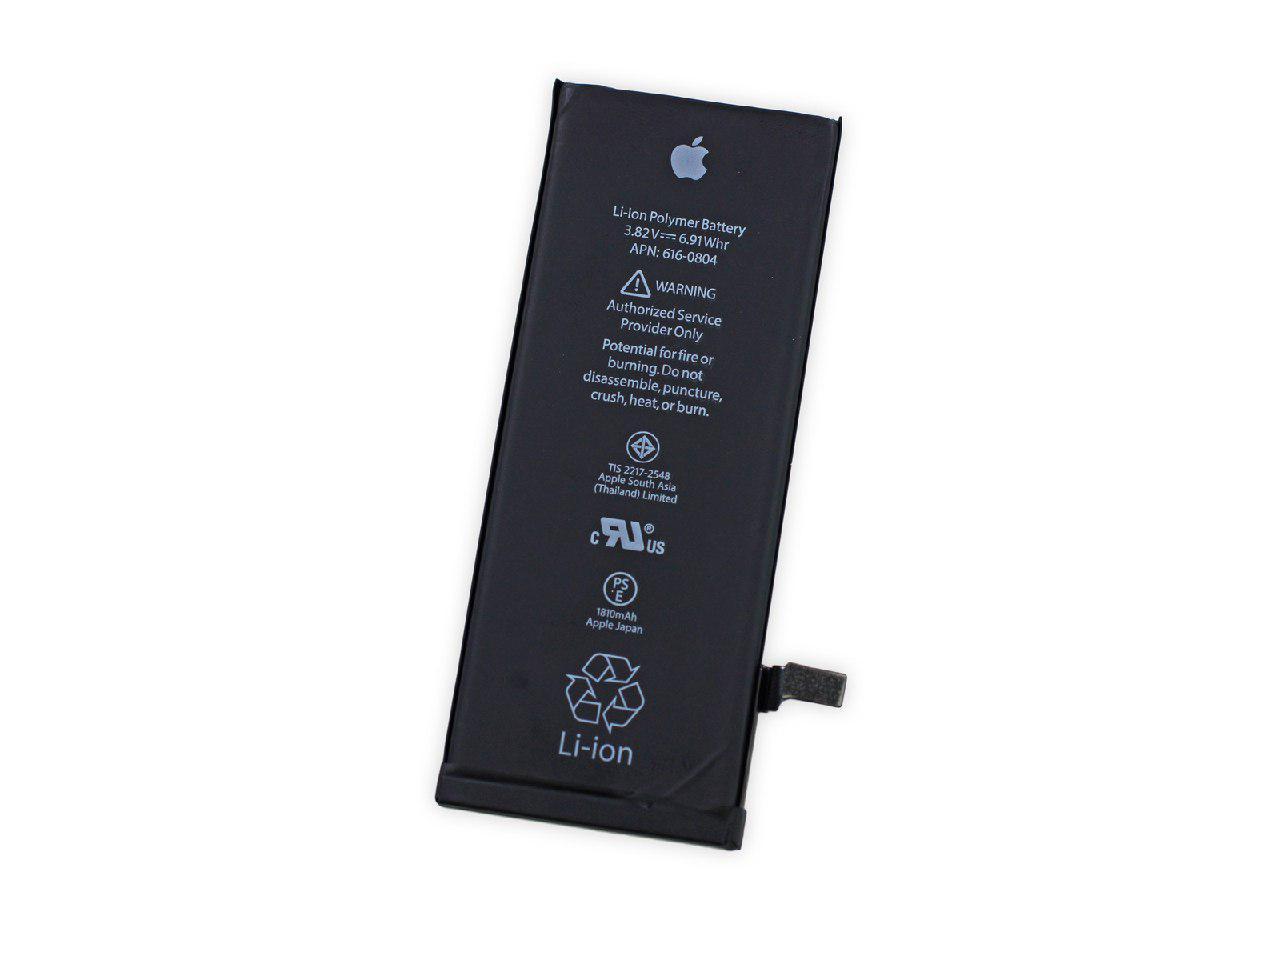 Apple iPhone 6 4.7 Inch Battery Li-Ion-Polymer 3.82V 1810 mAh 6.9 Wh Original Quality